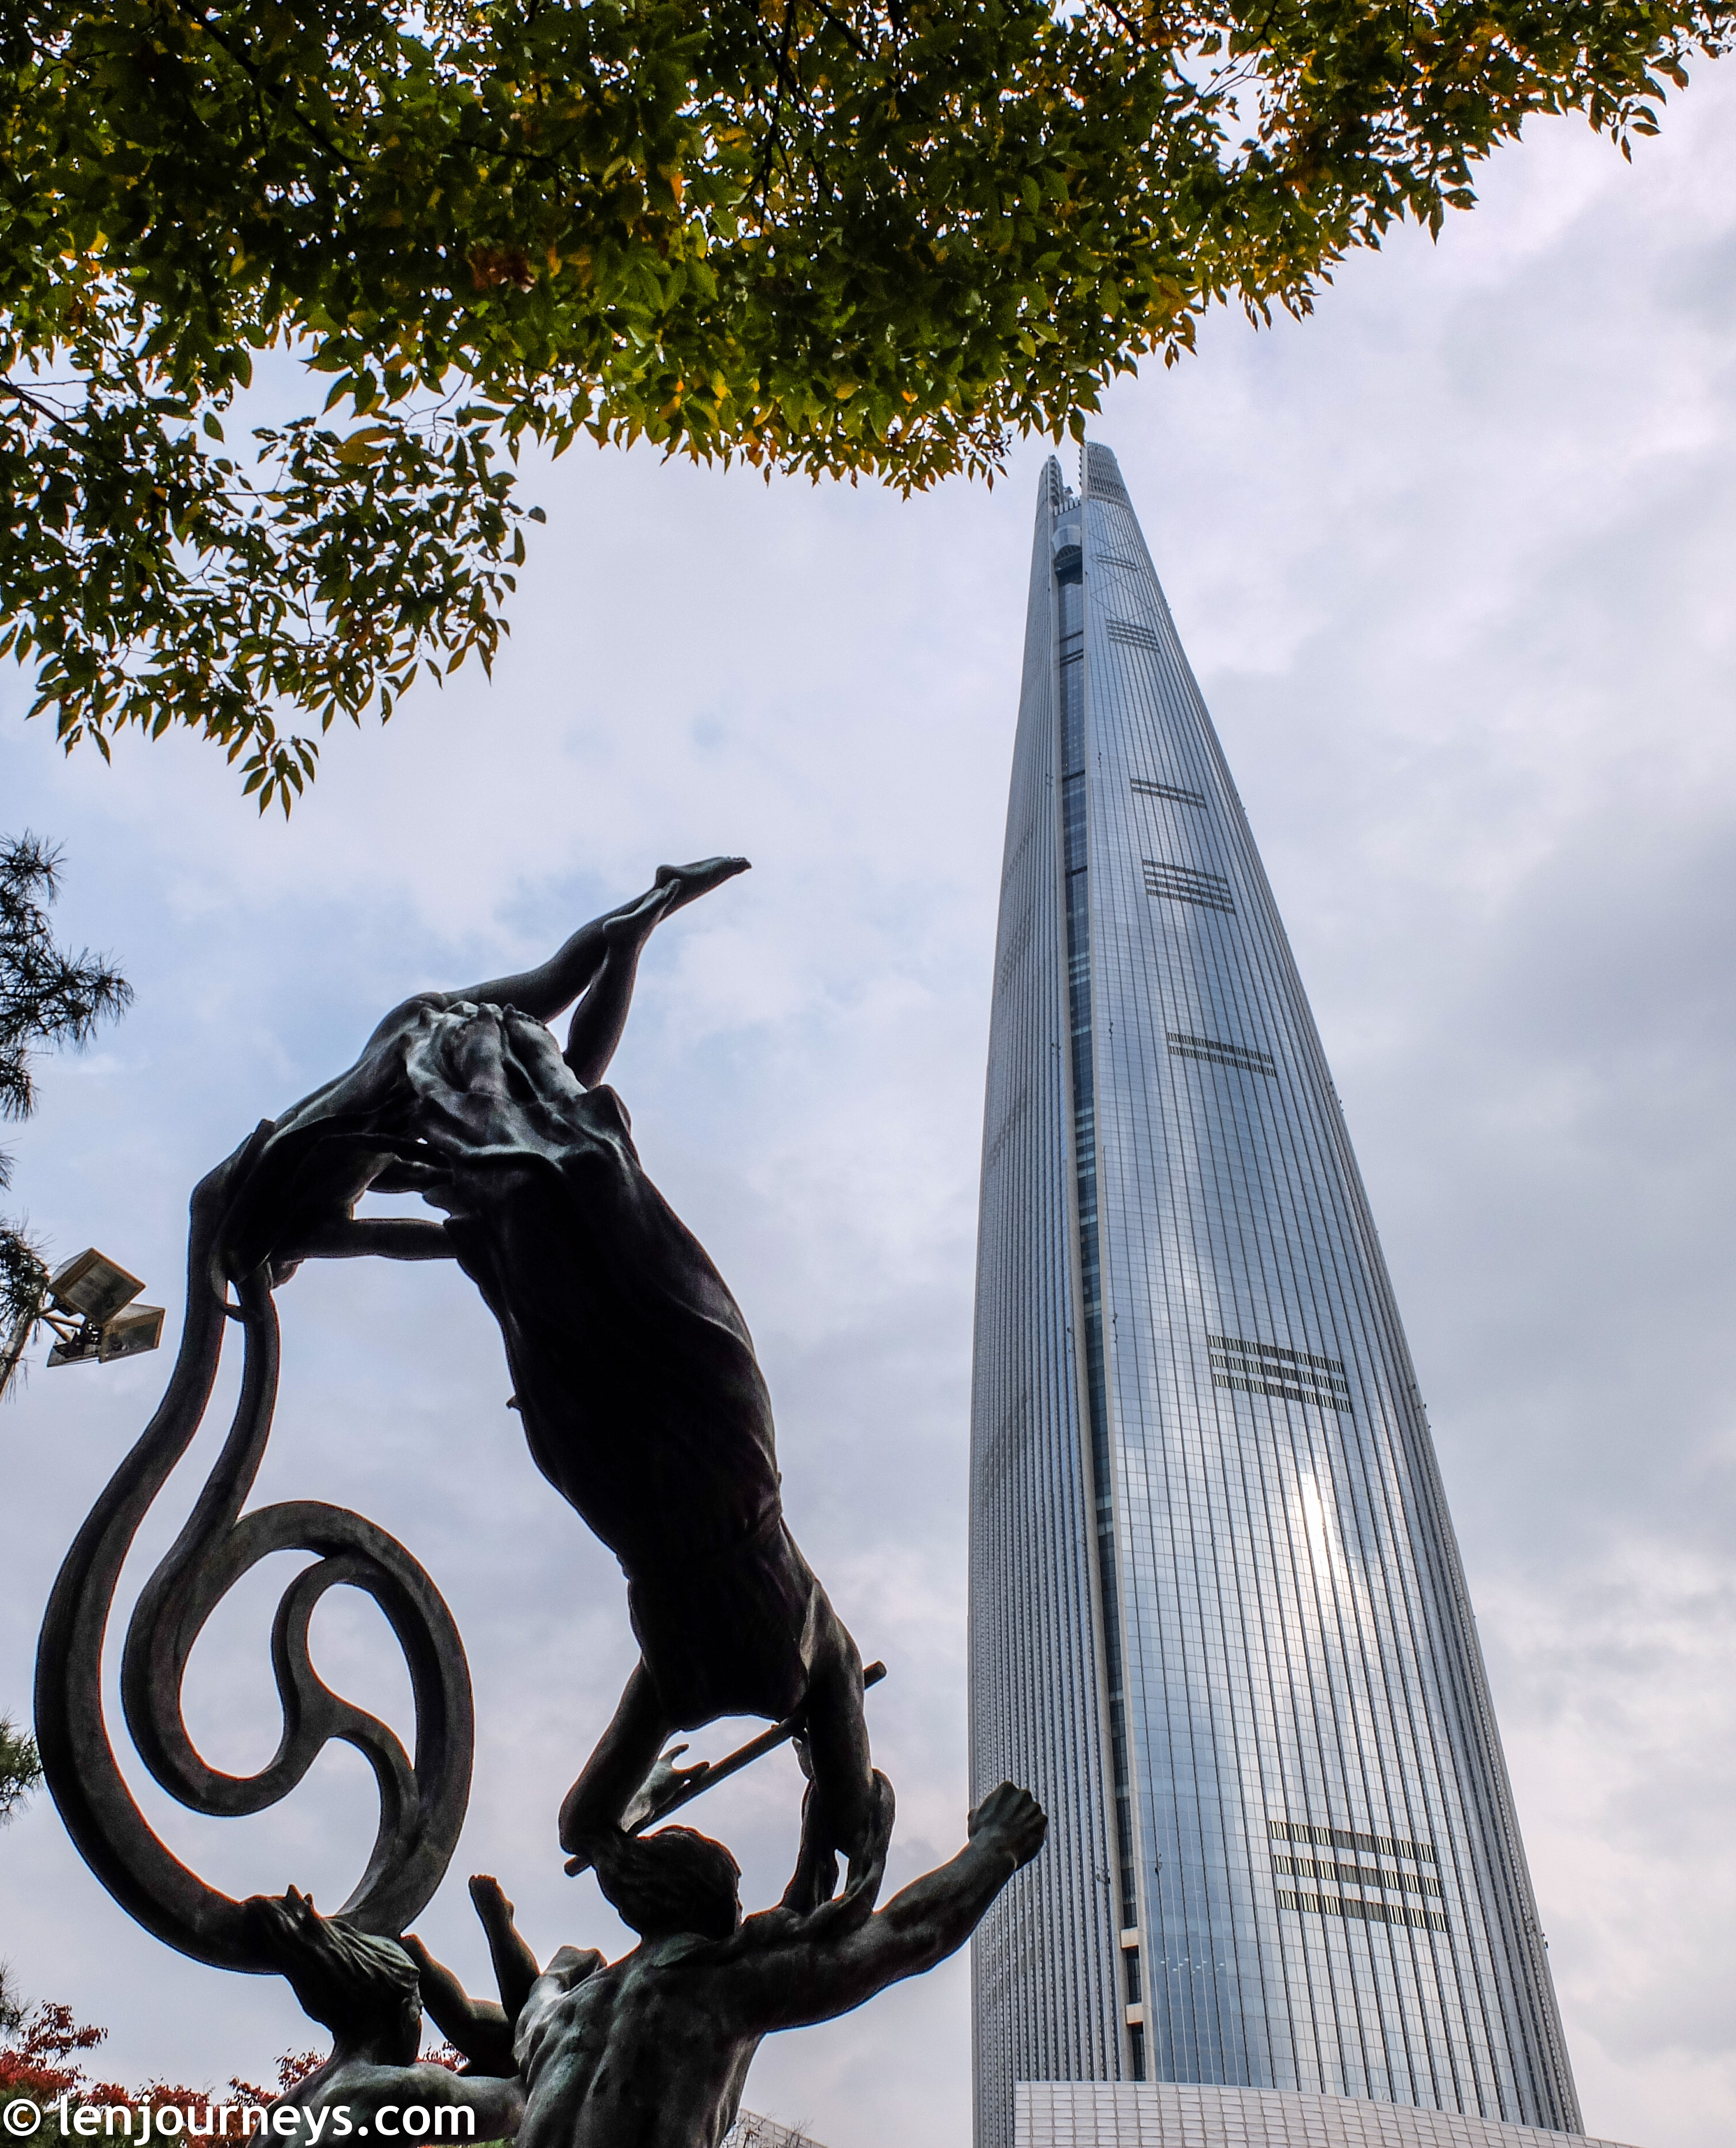 Lotte World Tower, Gangnam